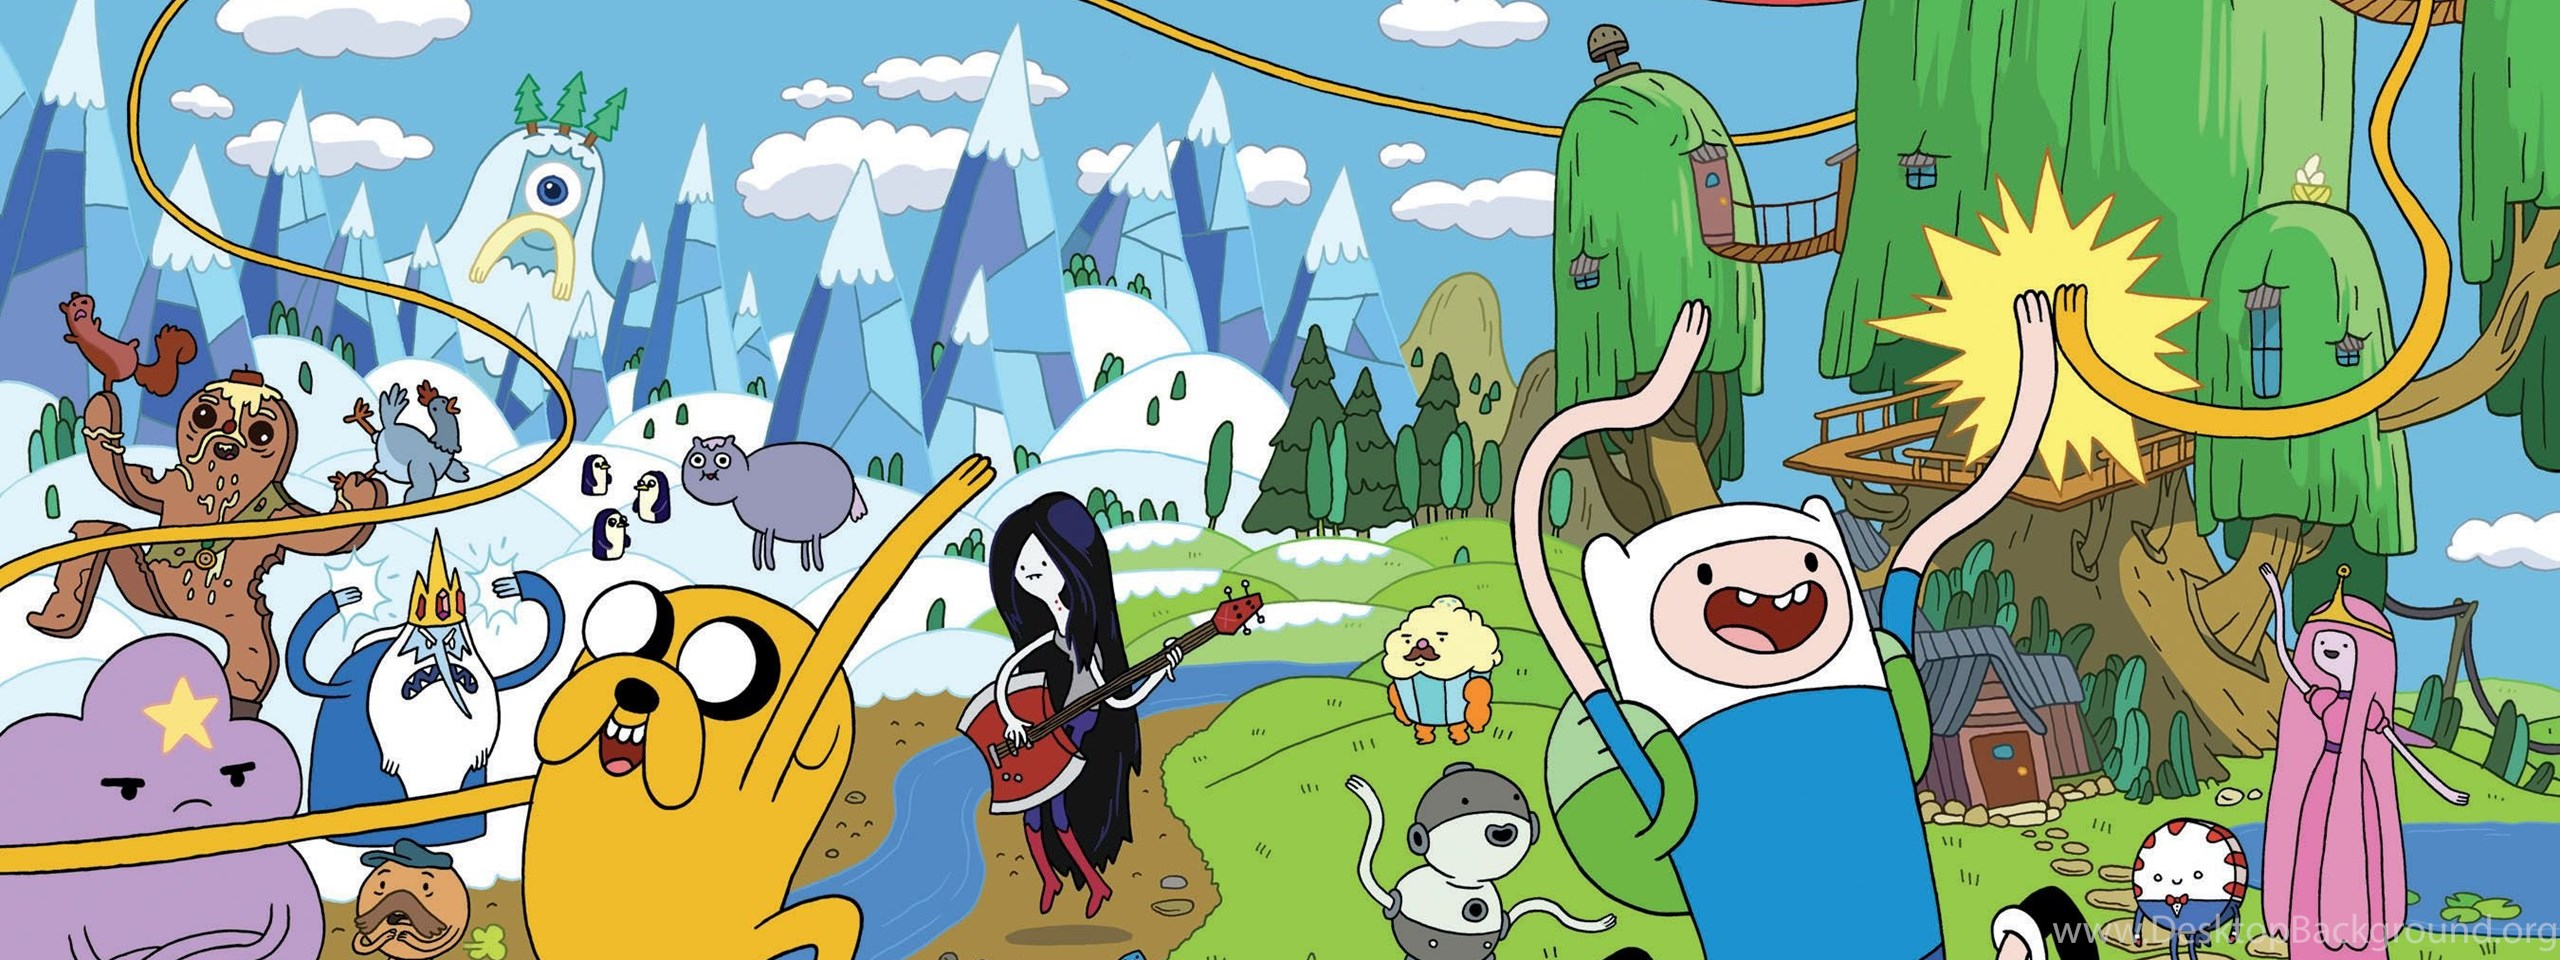 Adventure Time Wallpapers Hd Wallpapers 97645 Desktop Background